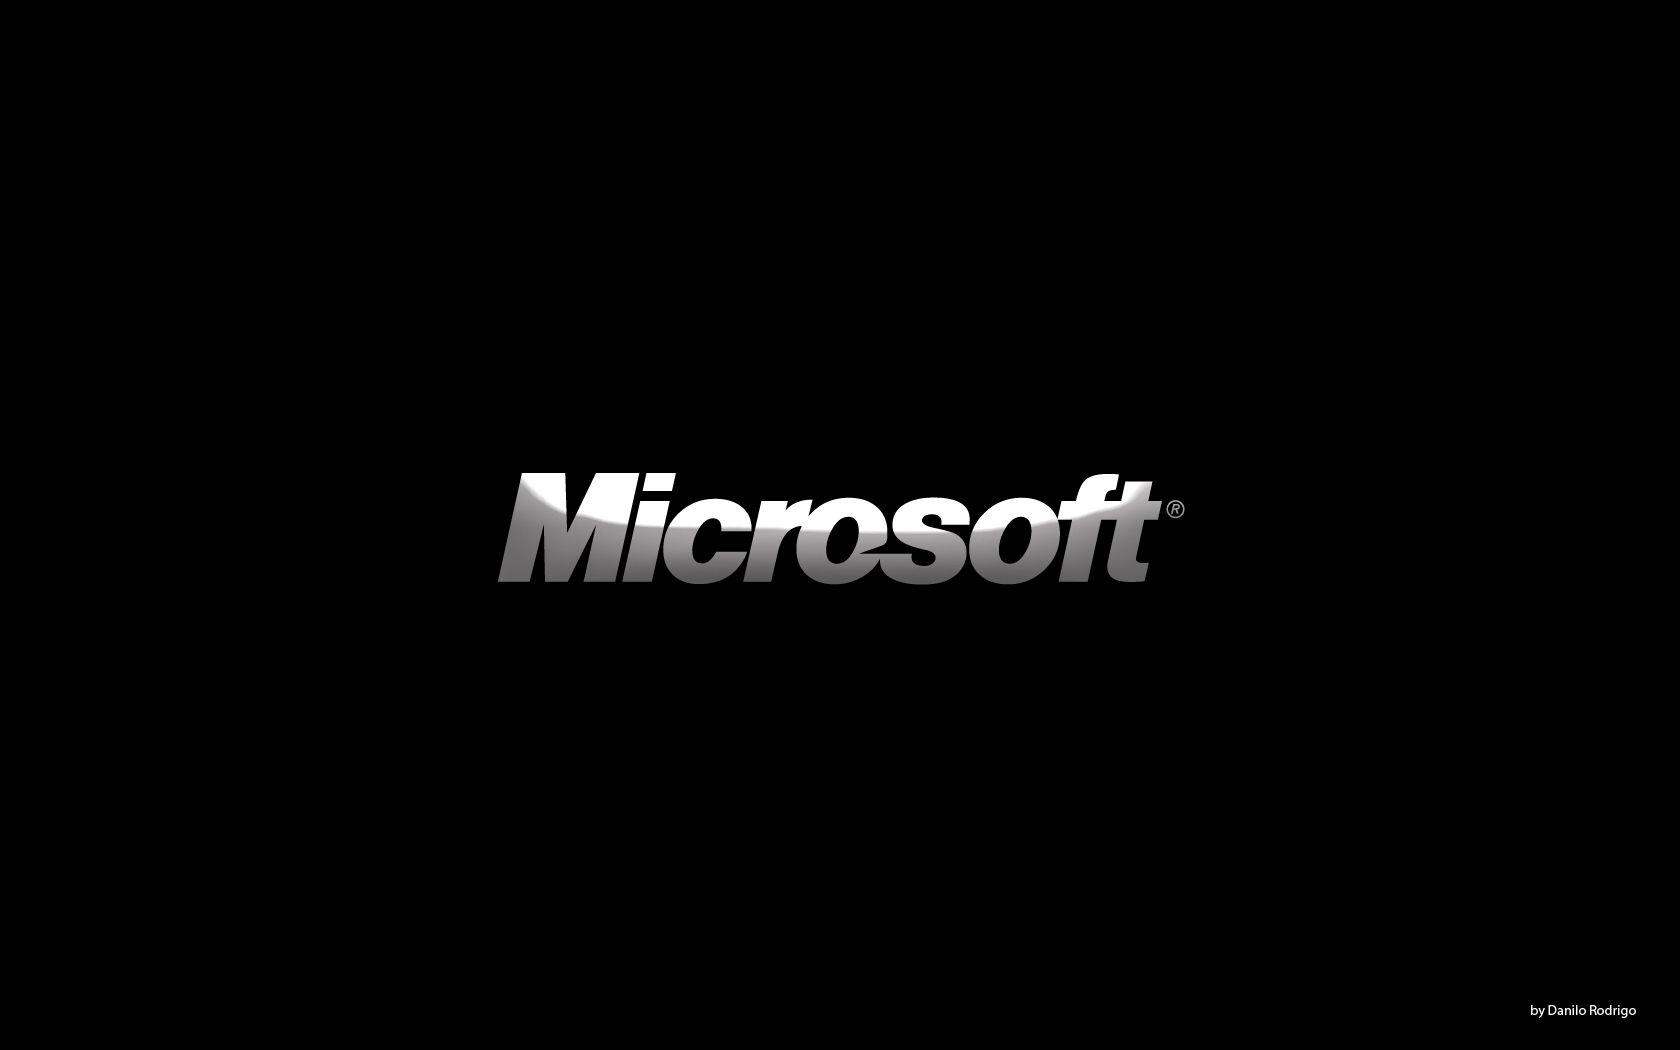 Desktop Microsoft Wallpaper 1680x1050 Computer Wallpapers 50